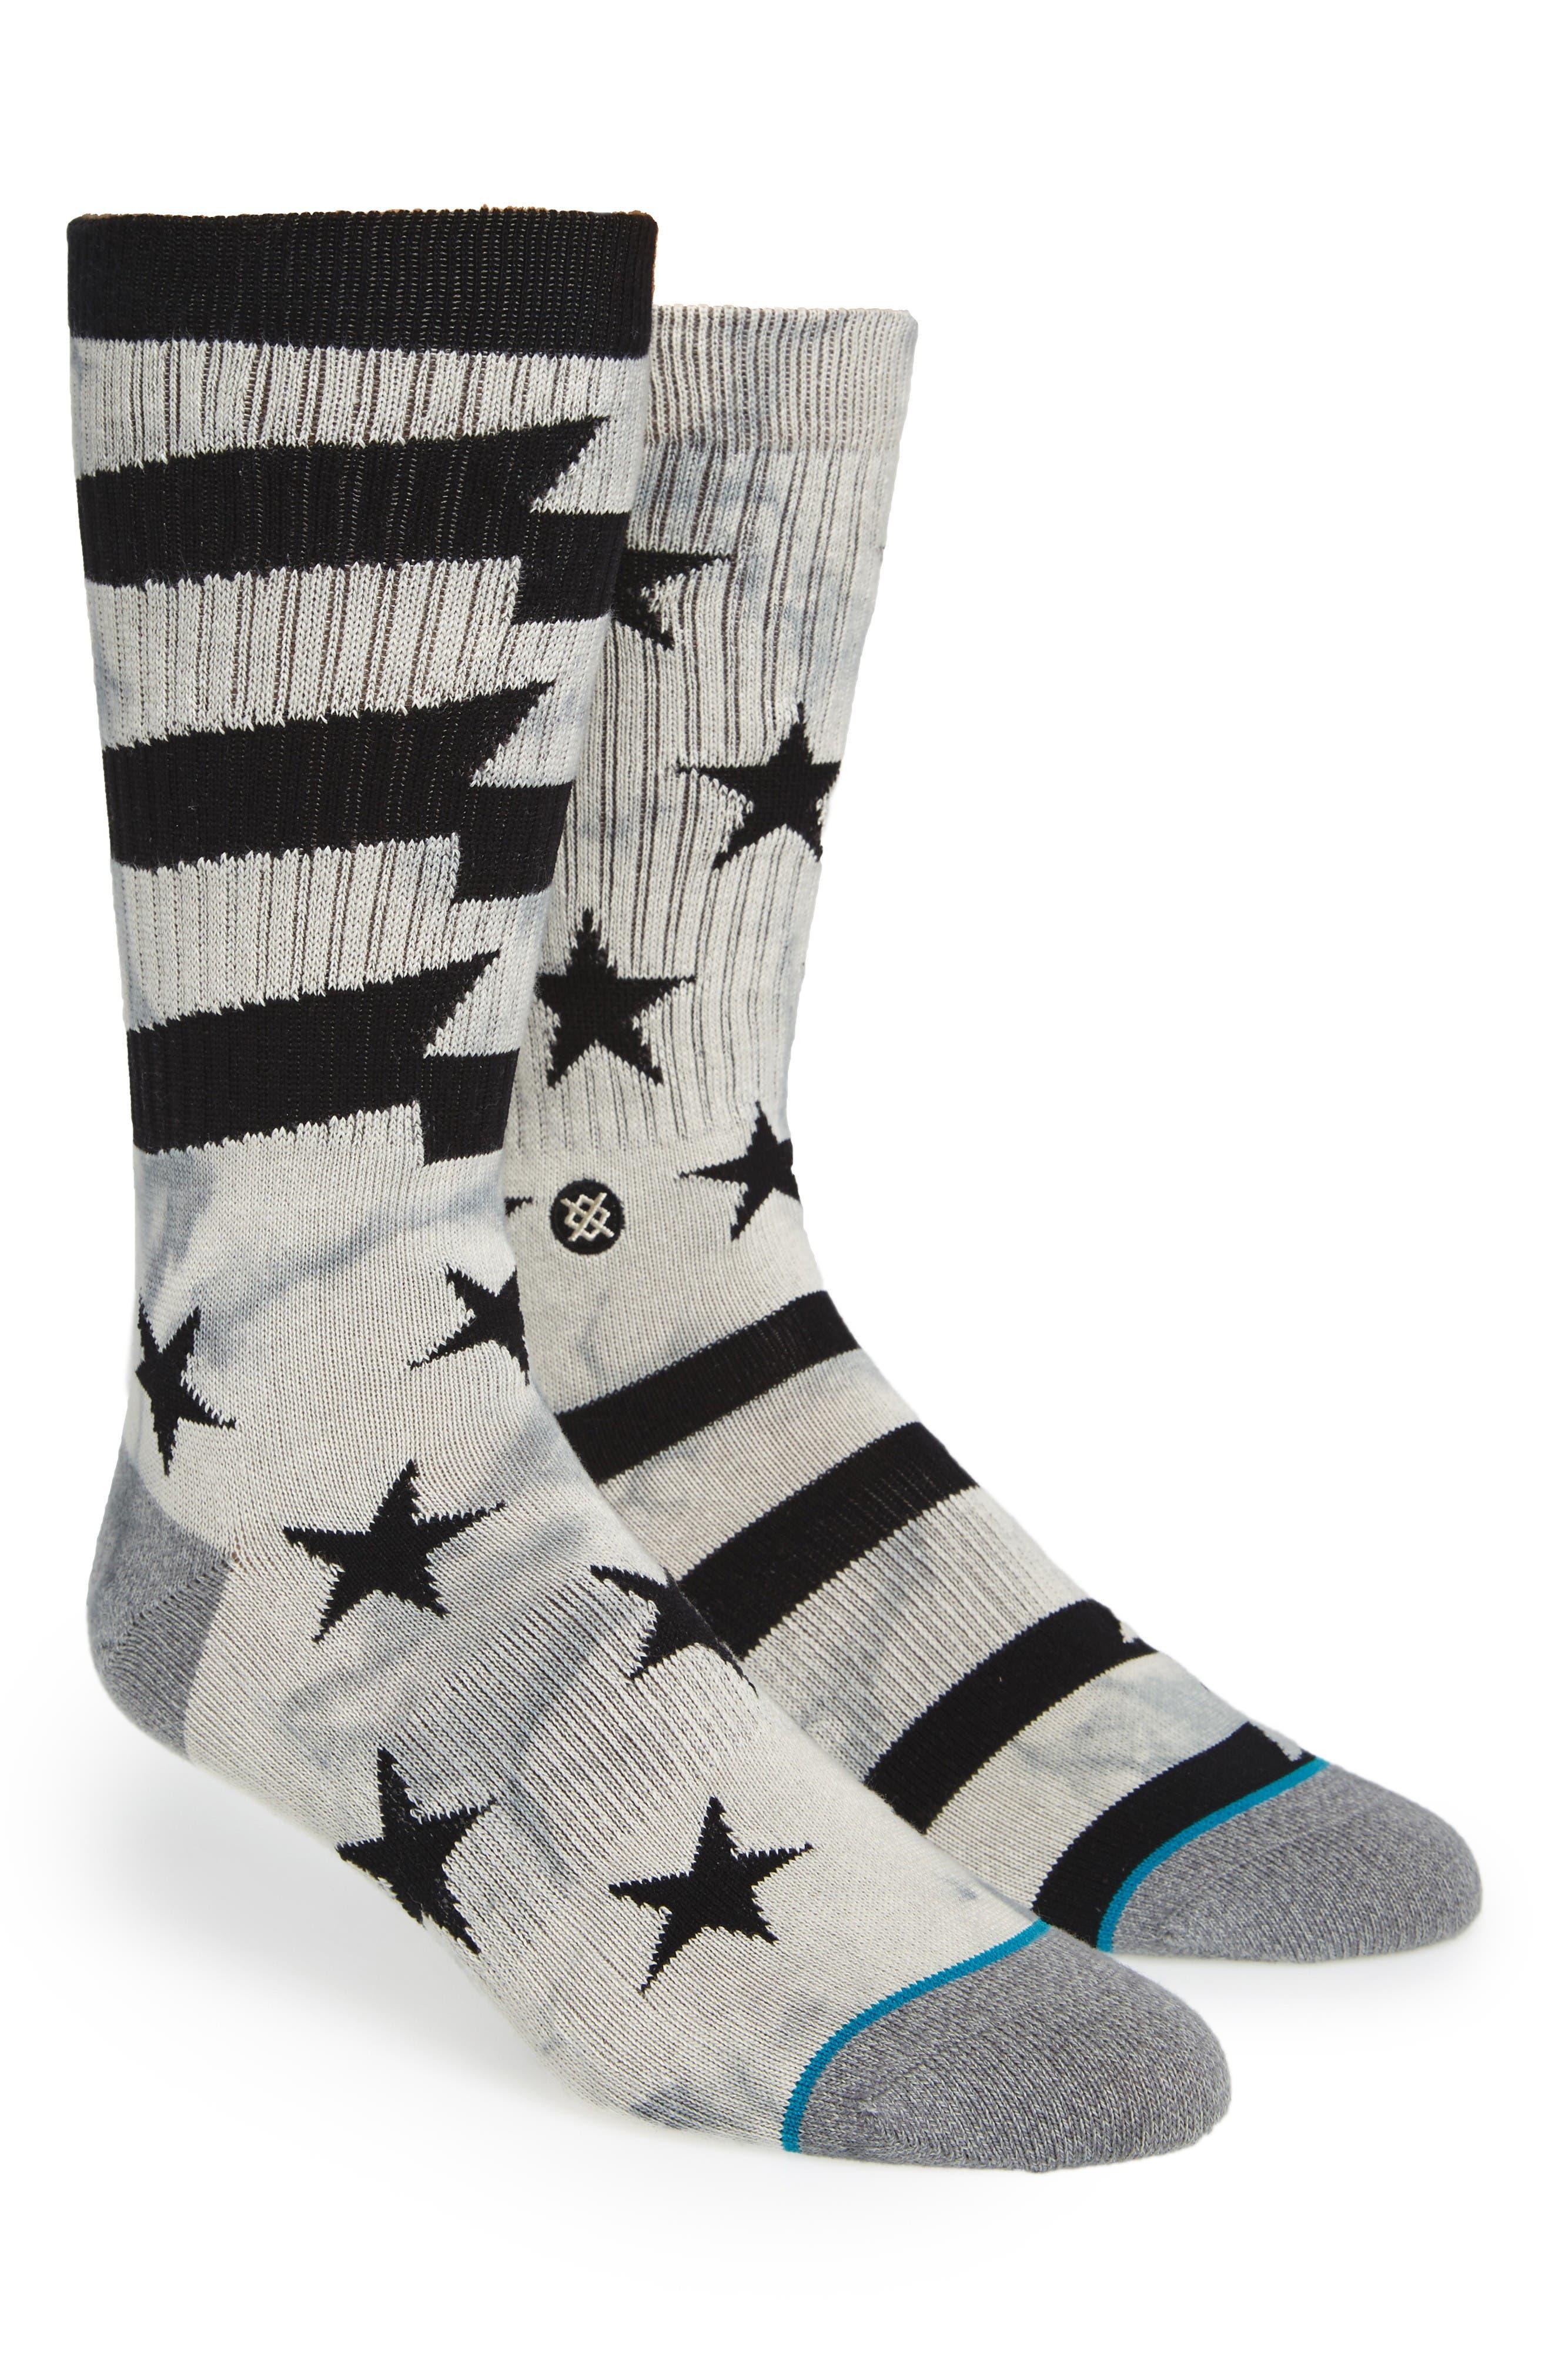 Sidereal Crew Socks,                         Main,                         color, Grey